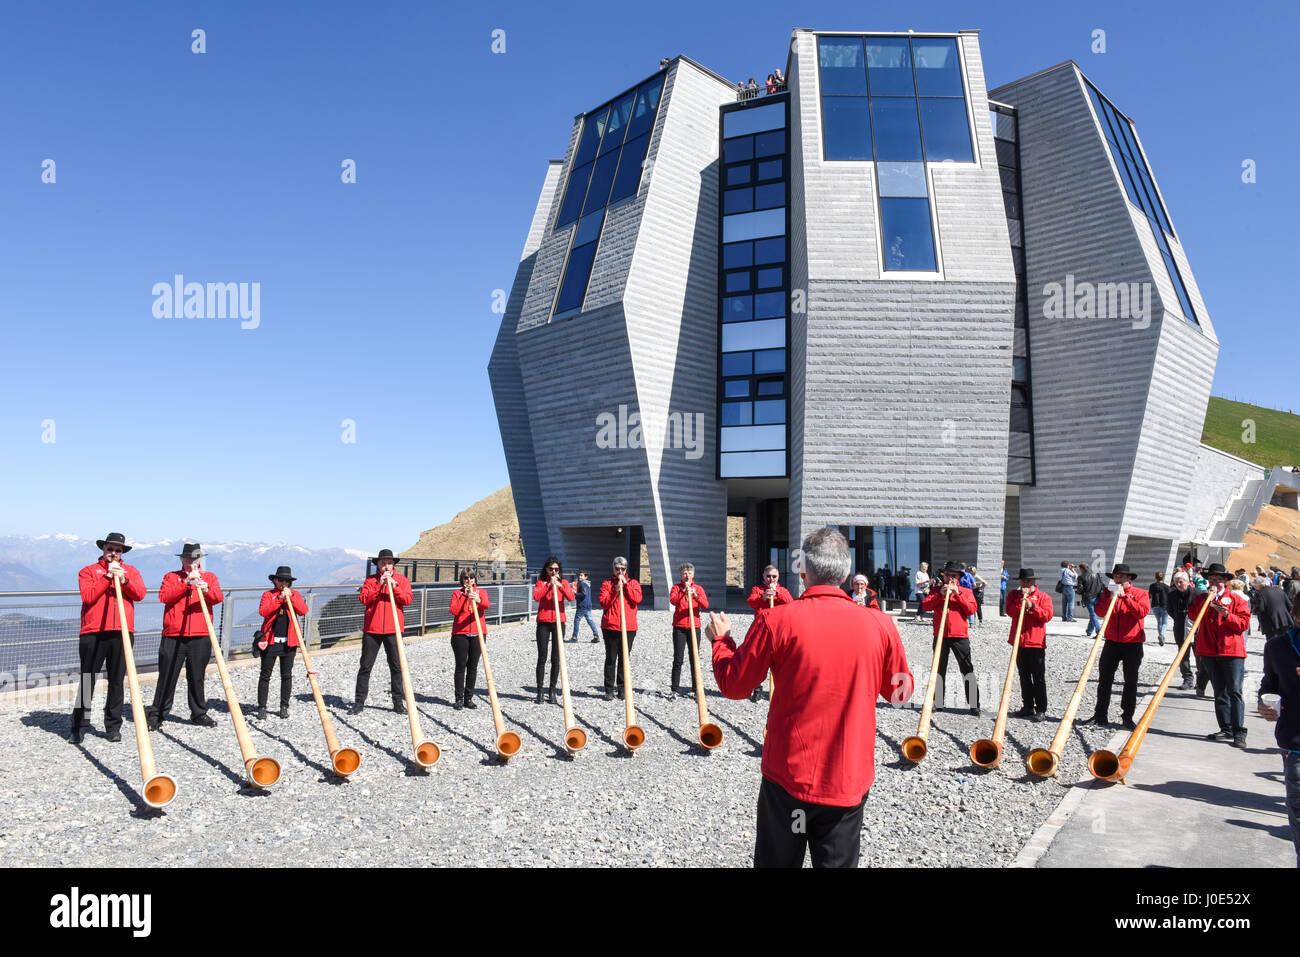 mount generoso, switzerland - 8 april 2017: people playing the